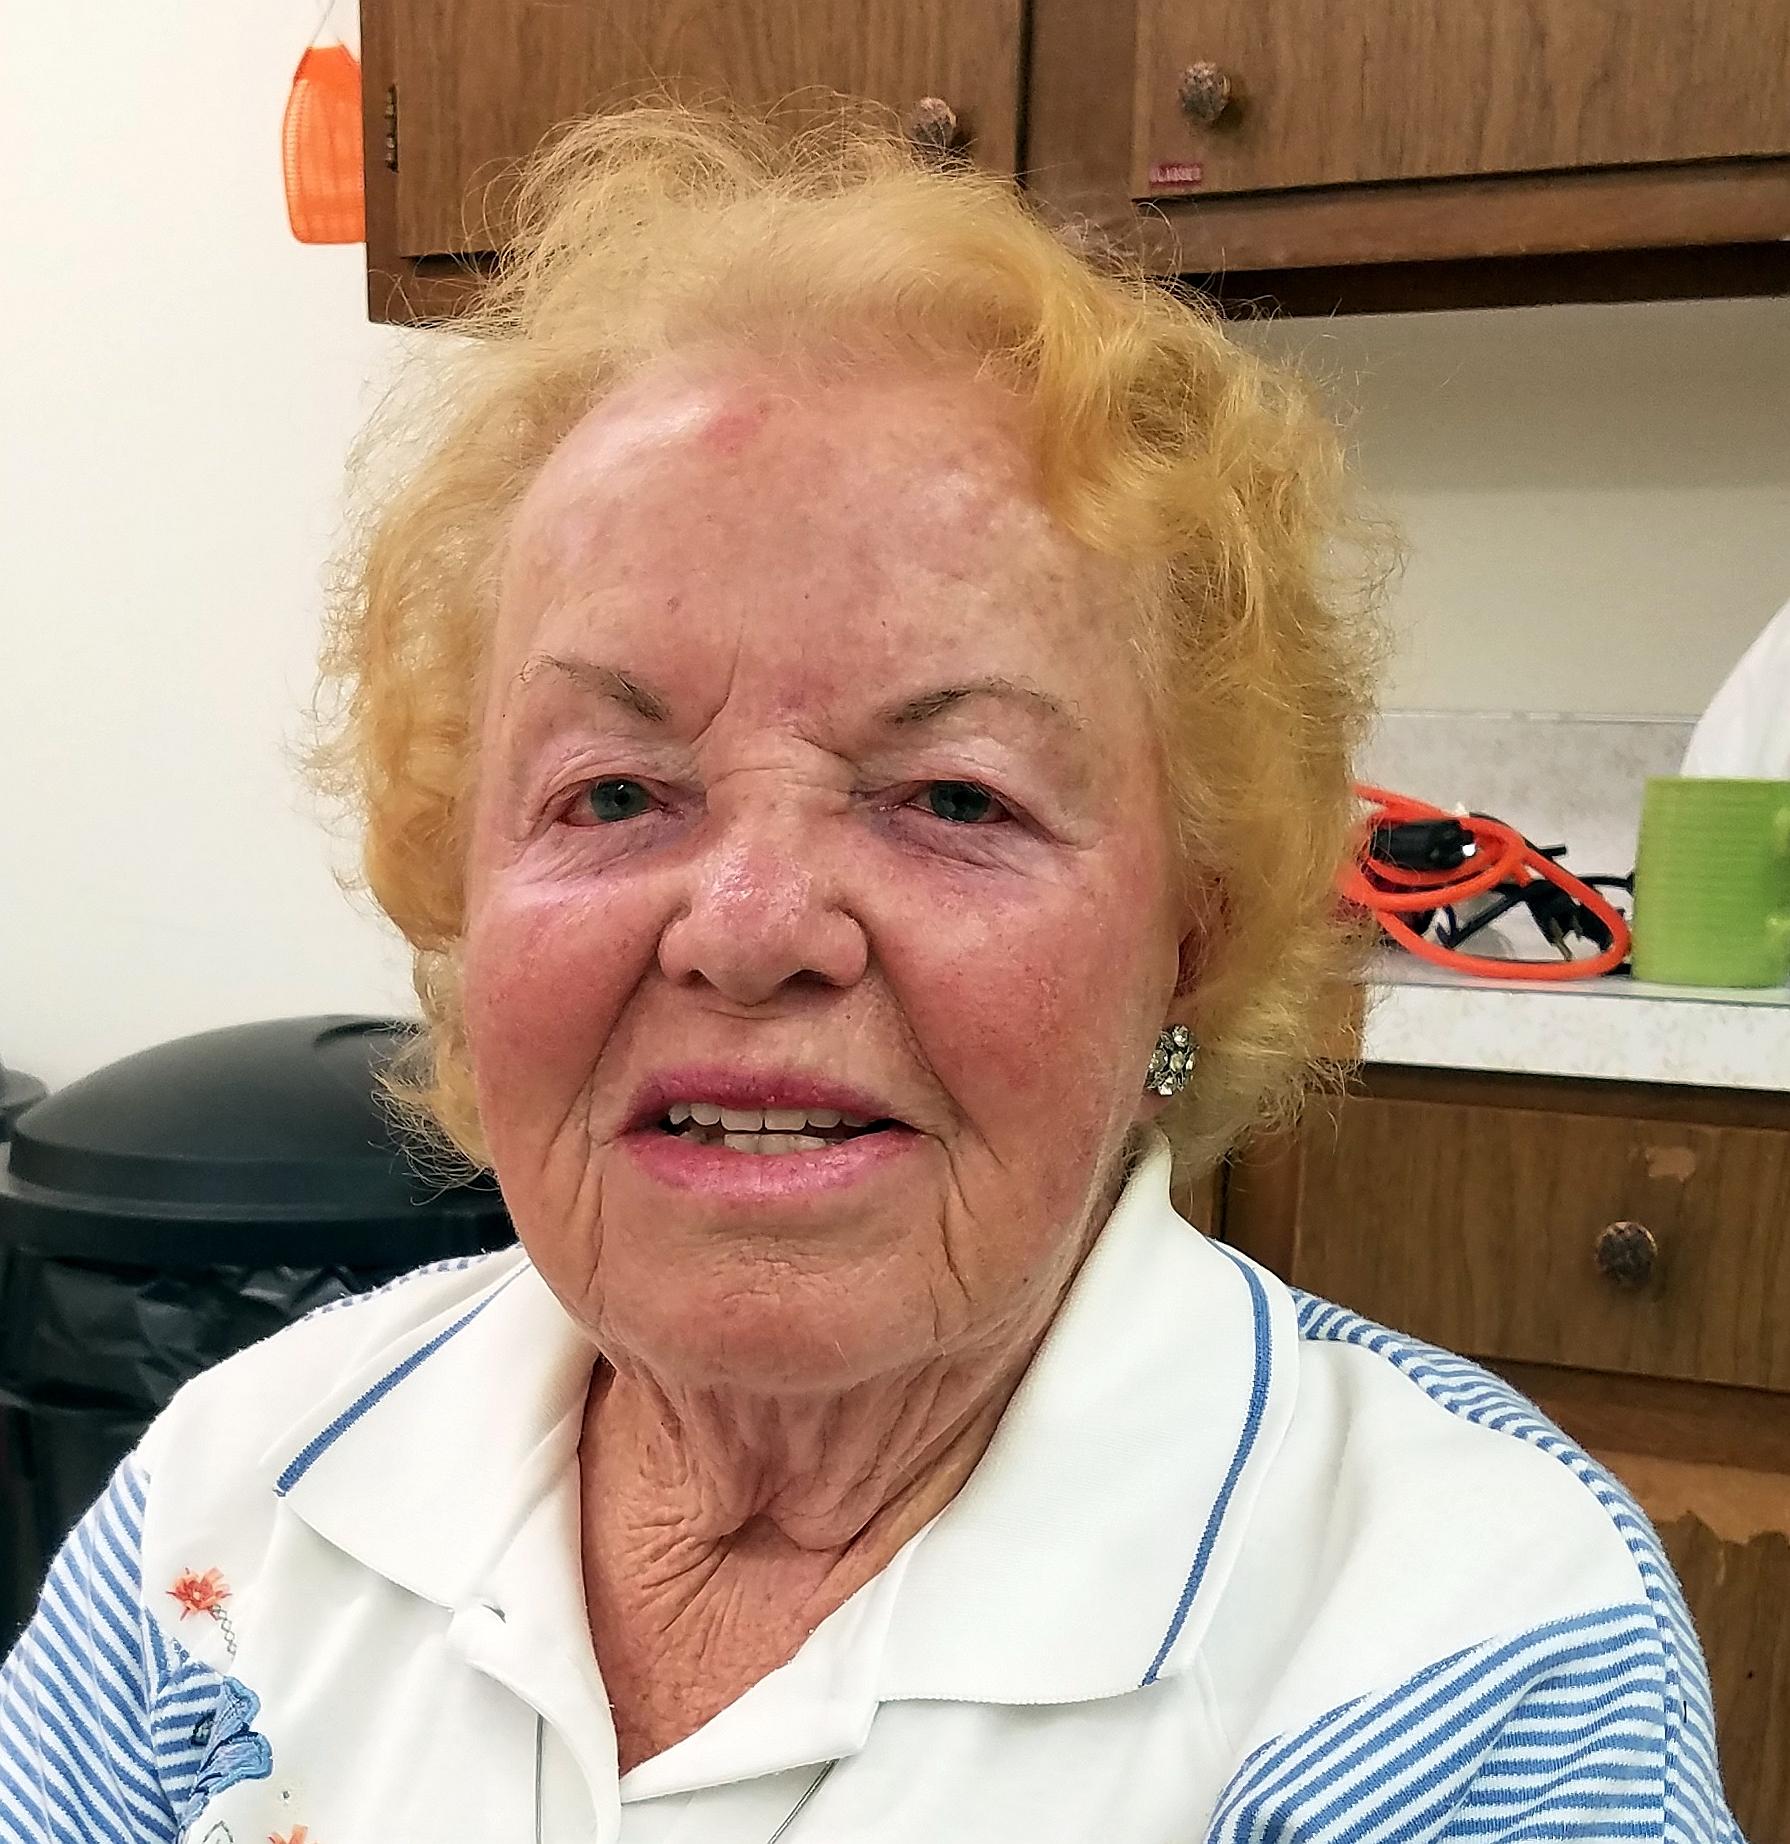 MARY SCHAFFER SHARES HER LIFE IN BROADUS, MONTANA